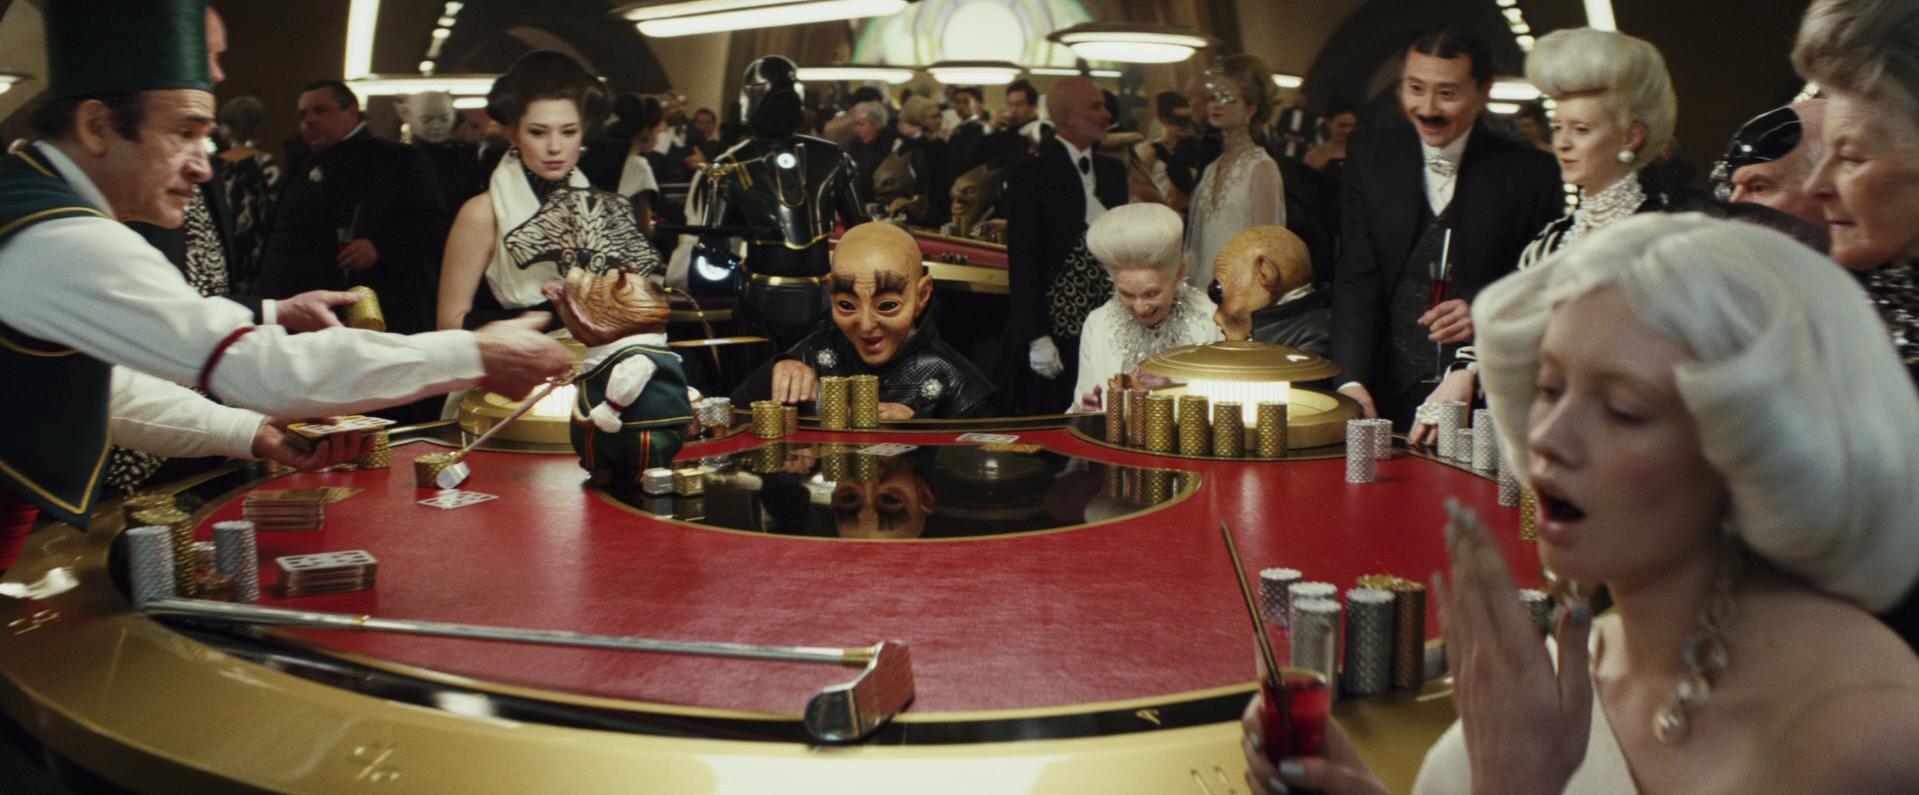 Grand ivy poker